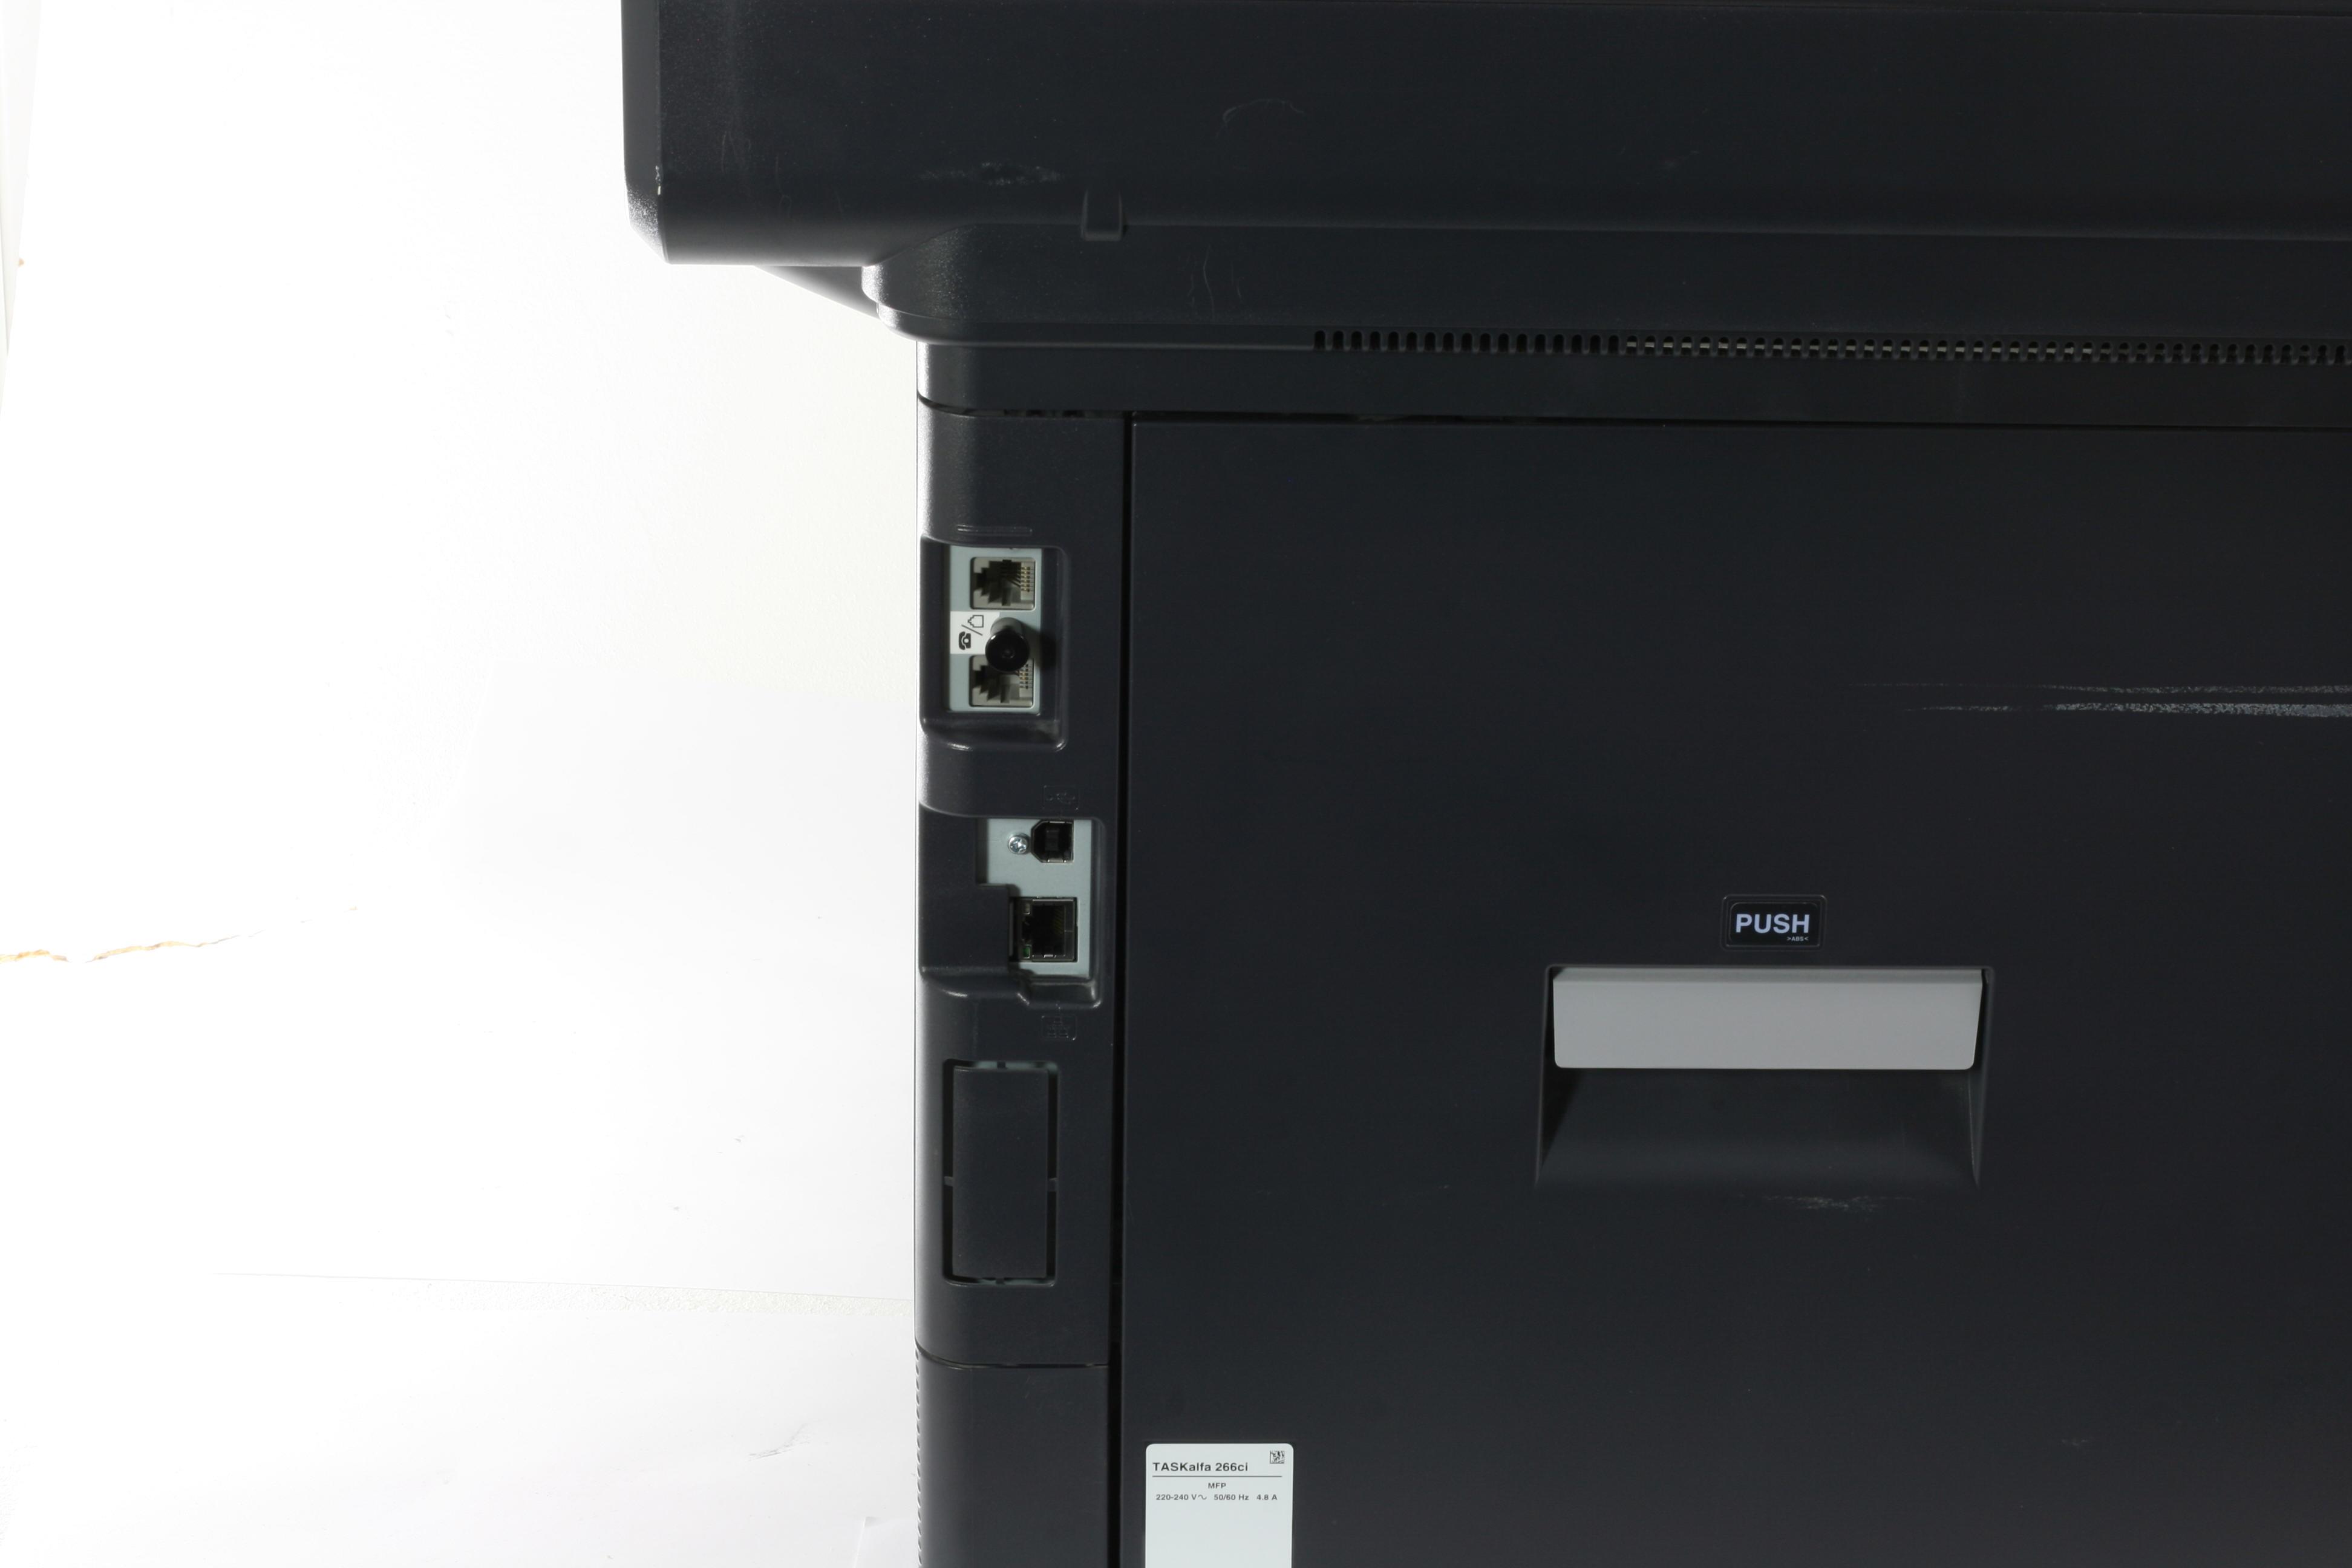 Kyocera Taskalfa 266ci MFP Drucker Laserdrucker Kopierer Scanner Fax Color gebraucht /  180